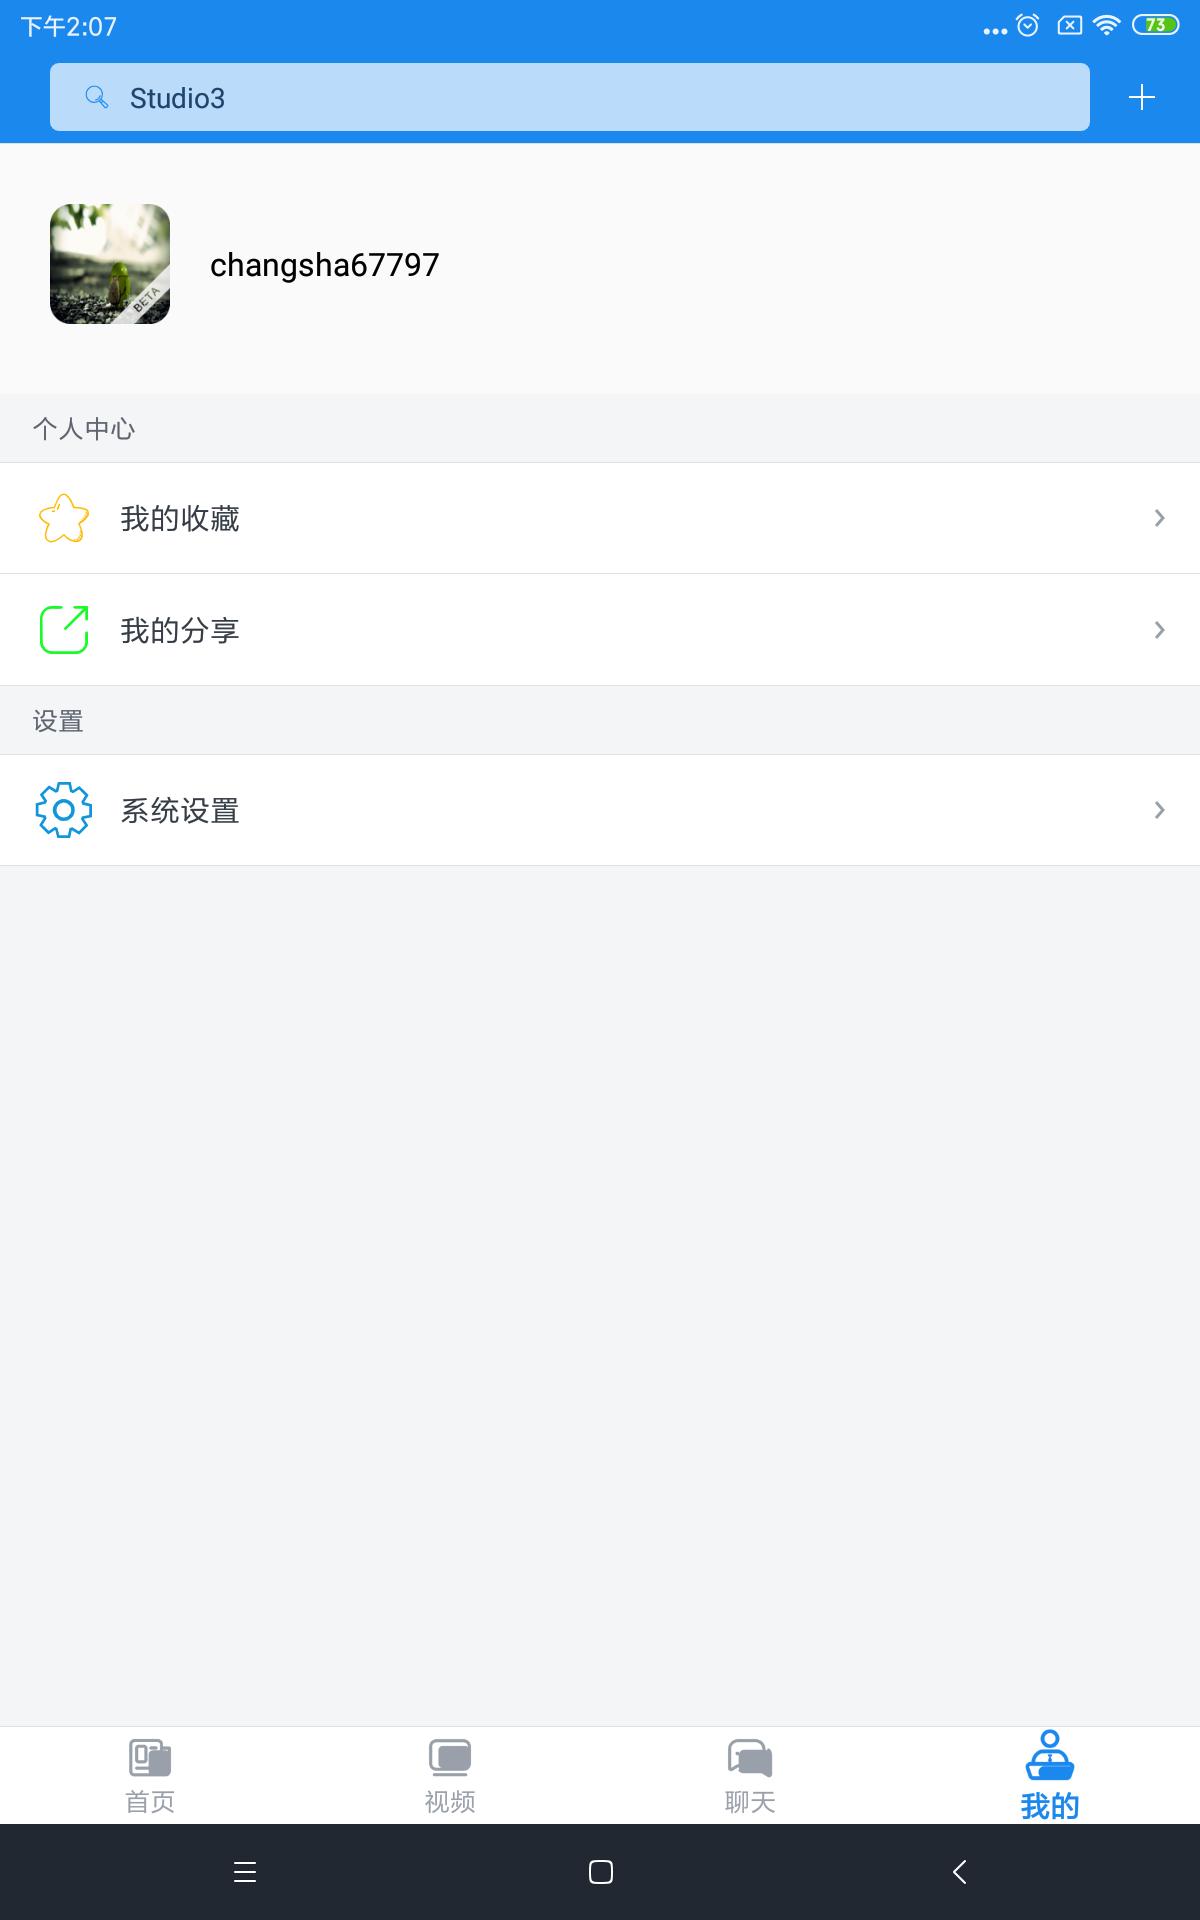 Screenshot_2021-10-06-14-07-08-149_com.zyx_hunan.wanmvvm.png